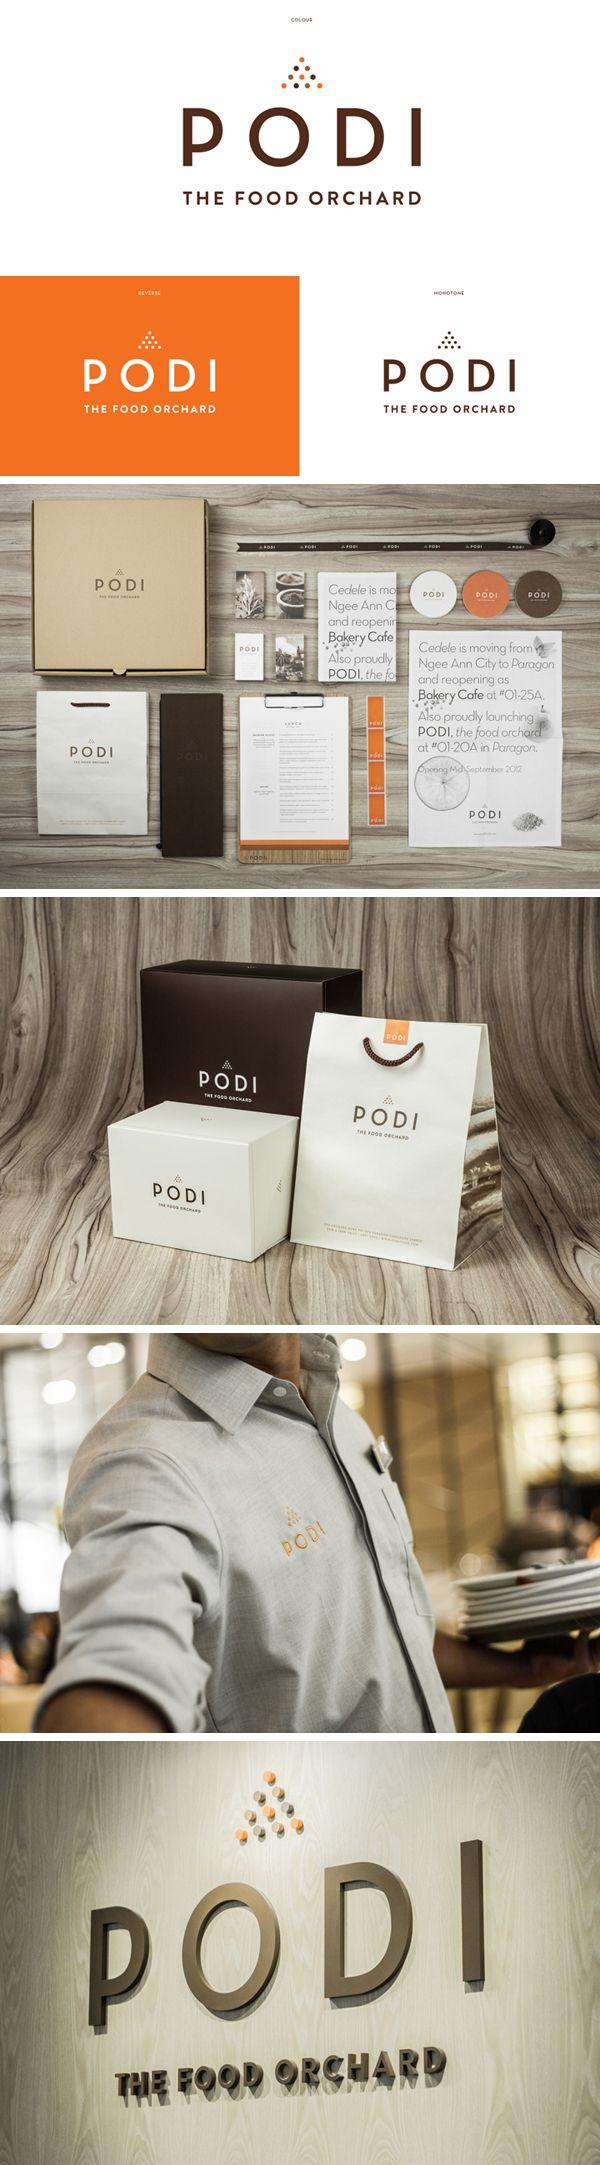 identity / Podi restaurant | #stationary #corporate #design #corporatedesign…